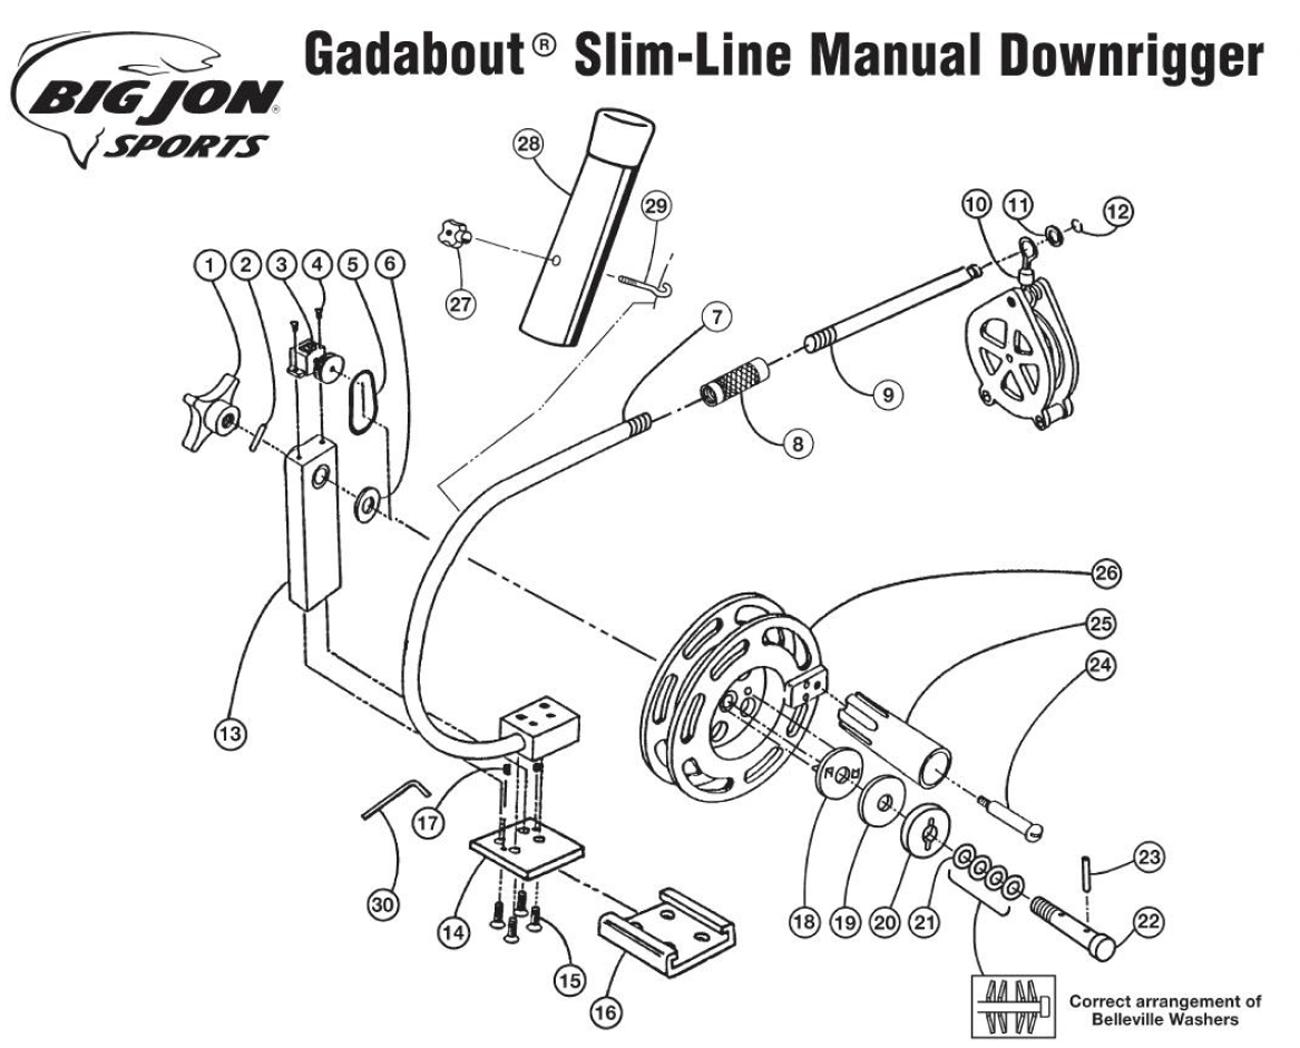 Order Big Jon Gadabout Slim Line Manual Downrigger Parts